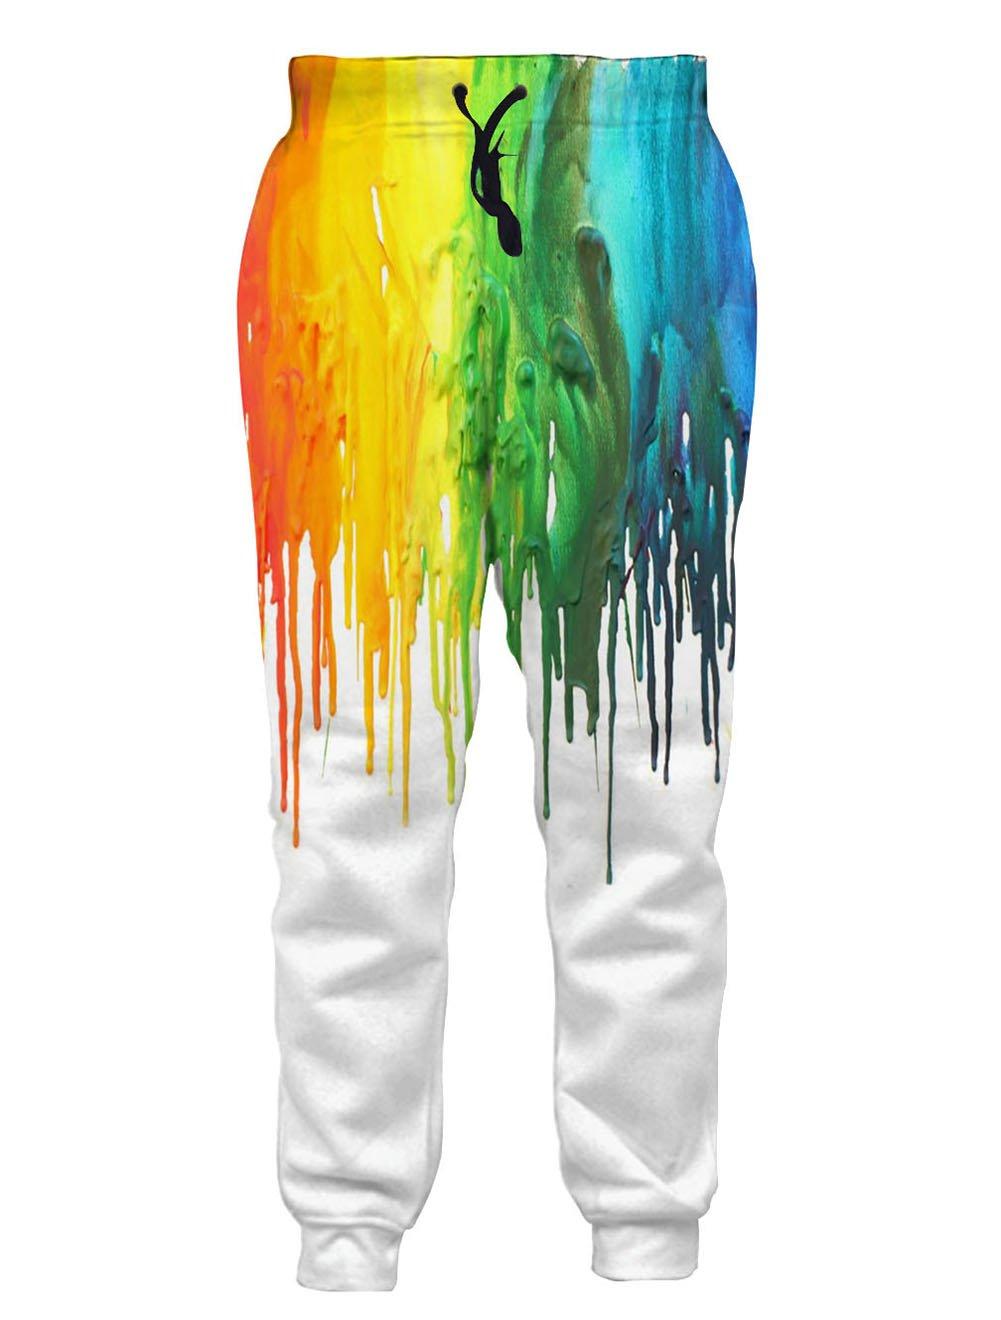 RAISEVERN Womens Melting Pattern Printed Casual Hip Hop Novelty Jogger Pants 2017 Style Melting Small